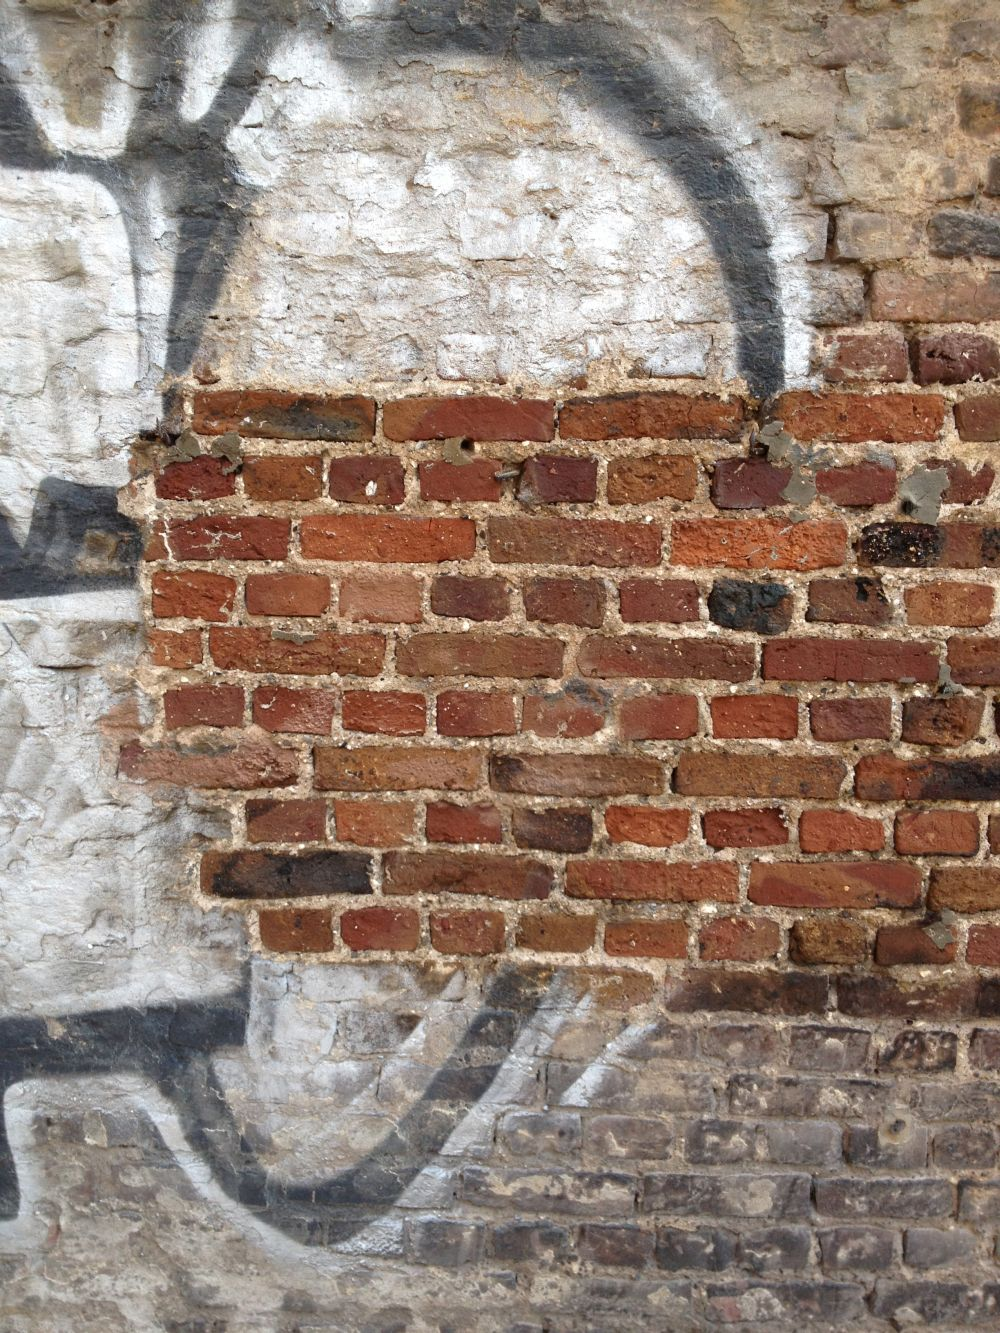 Graffiti-entfernen-45